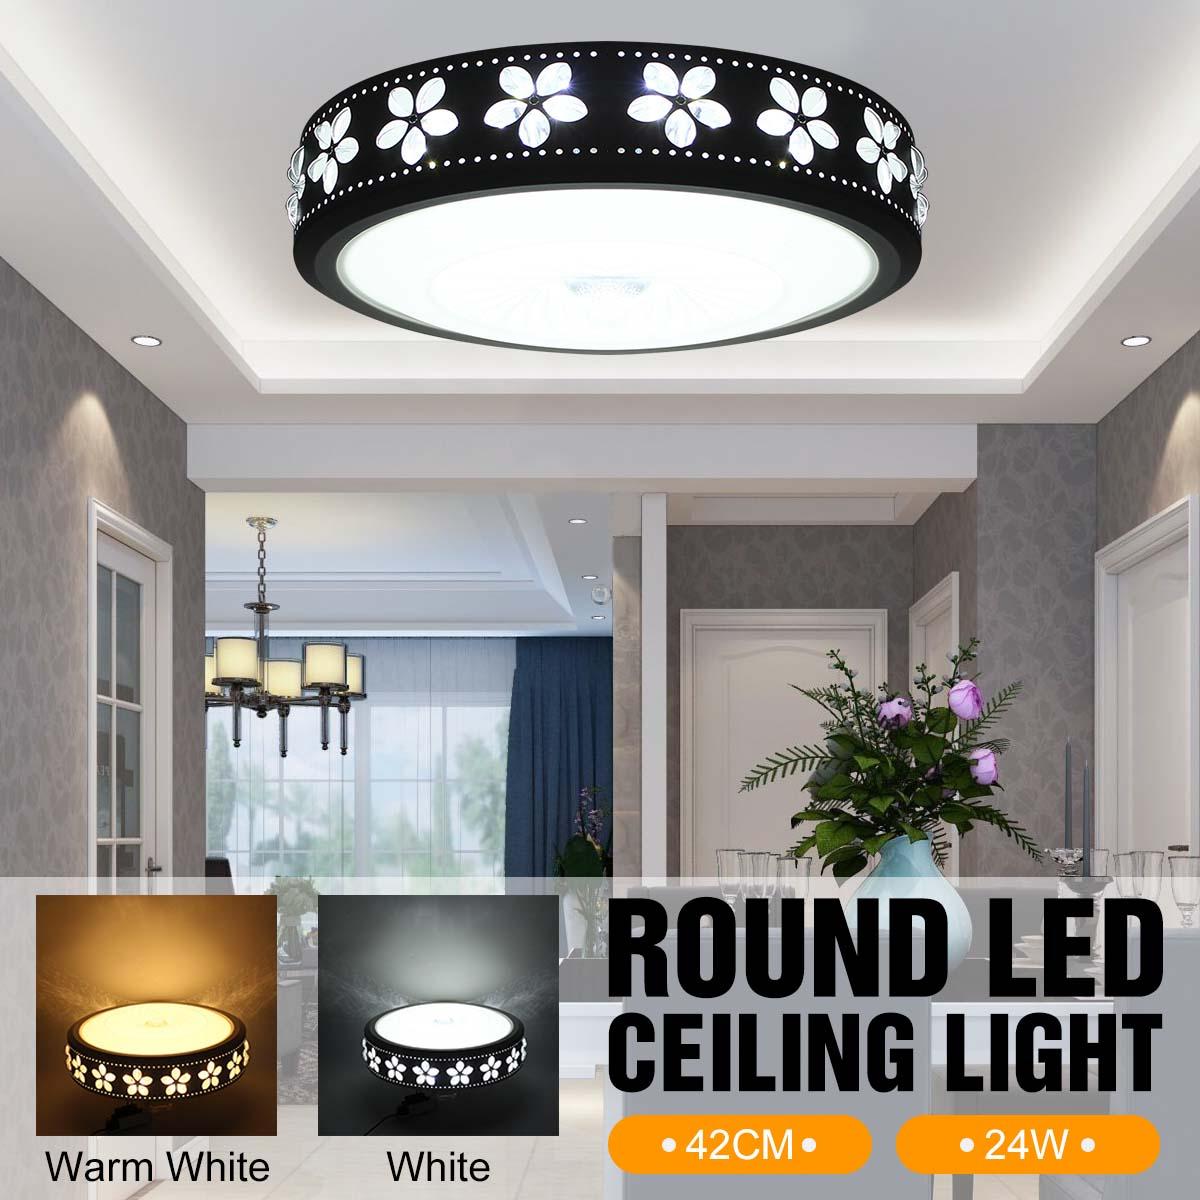 купить 100-240V 24W Surface Mounted Led Ceiling Lights Round Modern Ceiling Lamp for Living Room lamparas de techo for Bedroom Kitchen по цене 3399.88 рублей